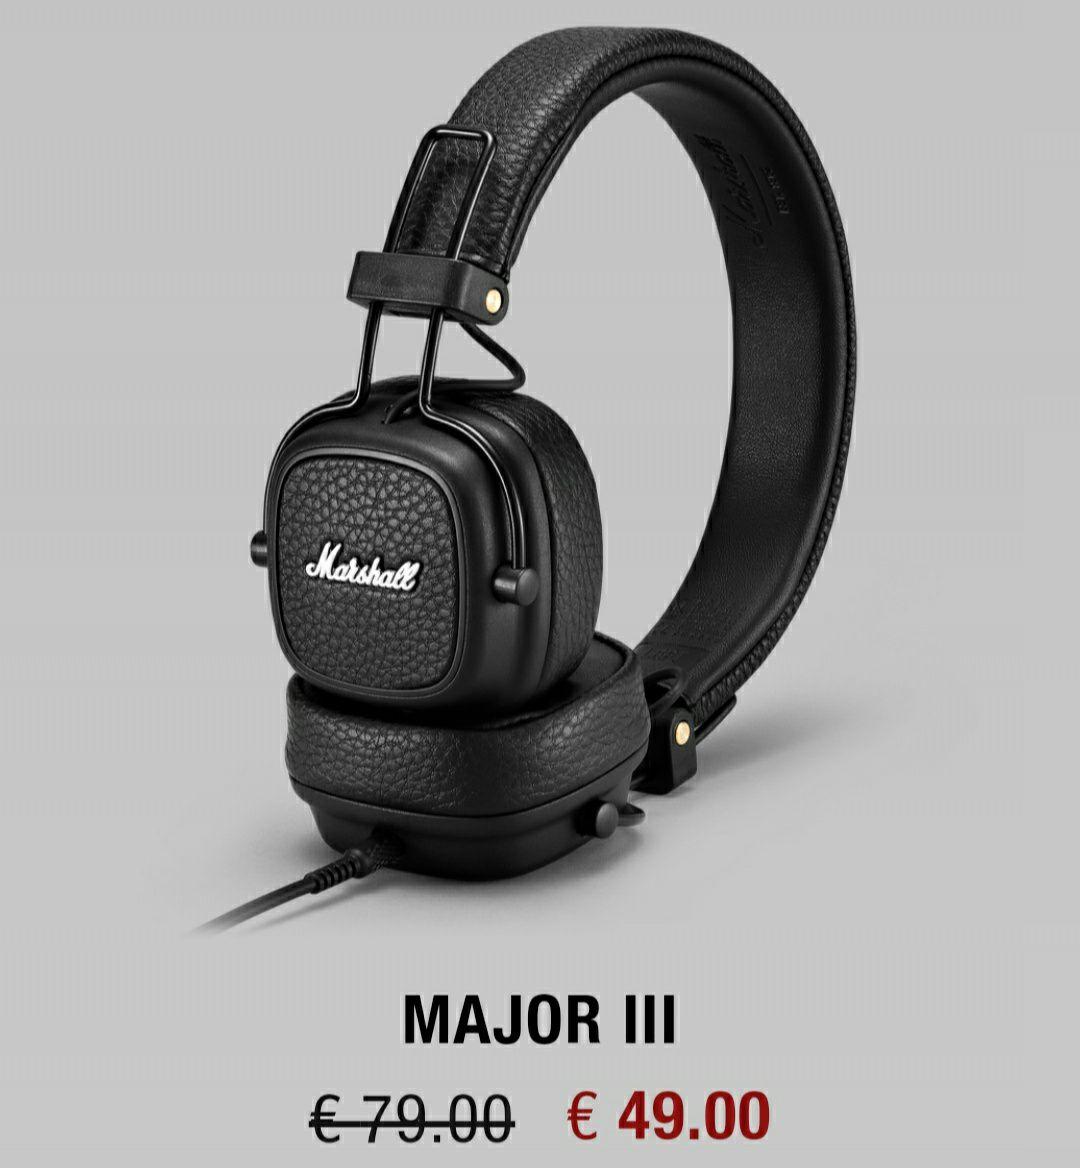 DESCUENTAZOS en Marshall Headphones - Cyber Monday